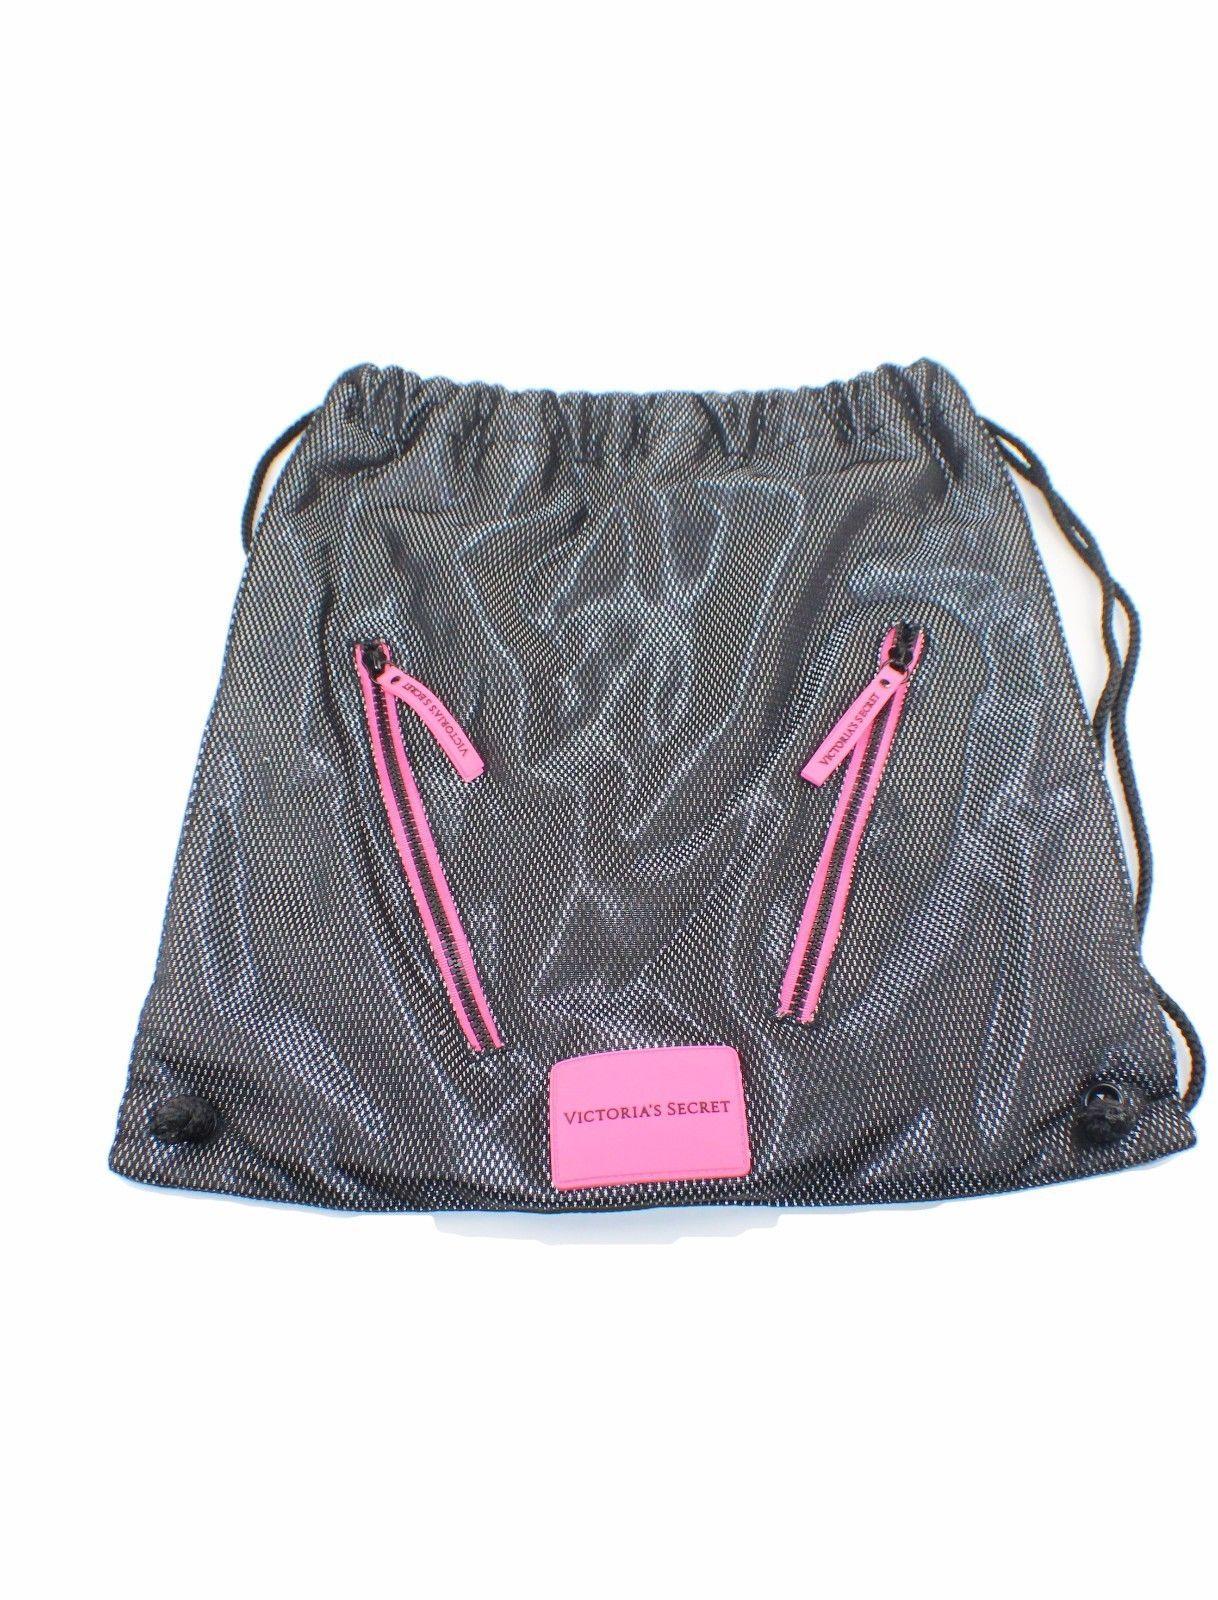 f9ed864ffd02 S l1600. S l1600. Previous. Victoria Secret Sport VSX Black Pink Gray Mesh  Drawstring Gym Backpack Tote Bag